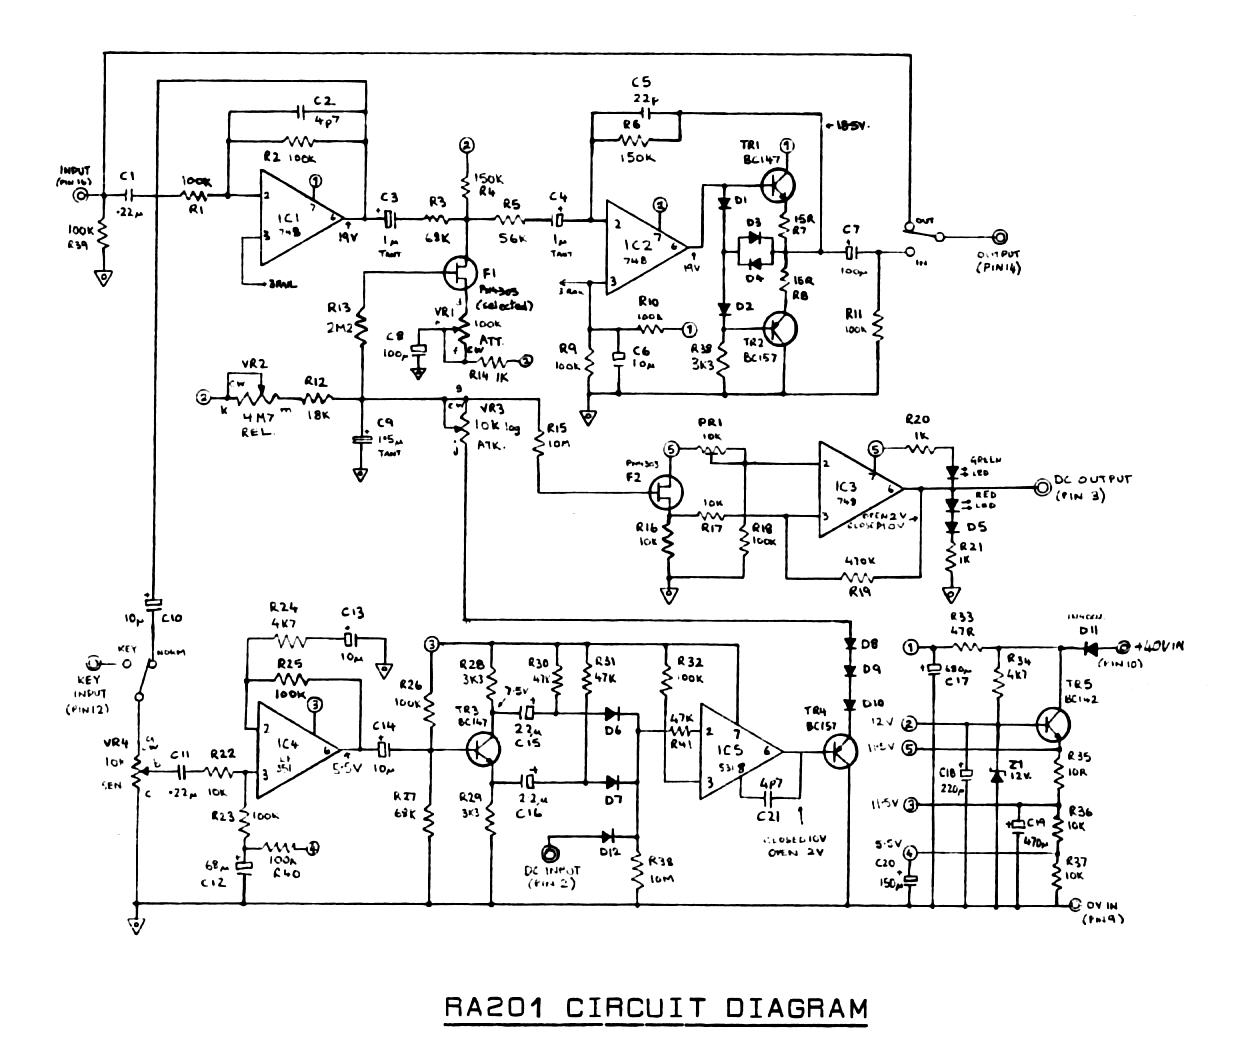 Saturn Radio Wiring Dia Diagram And Fuse Box Ford Flex Powersteeringdiagram 1 Besides 2000 Explorer Also 1988 Ranger Spark Plug